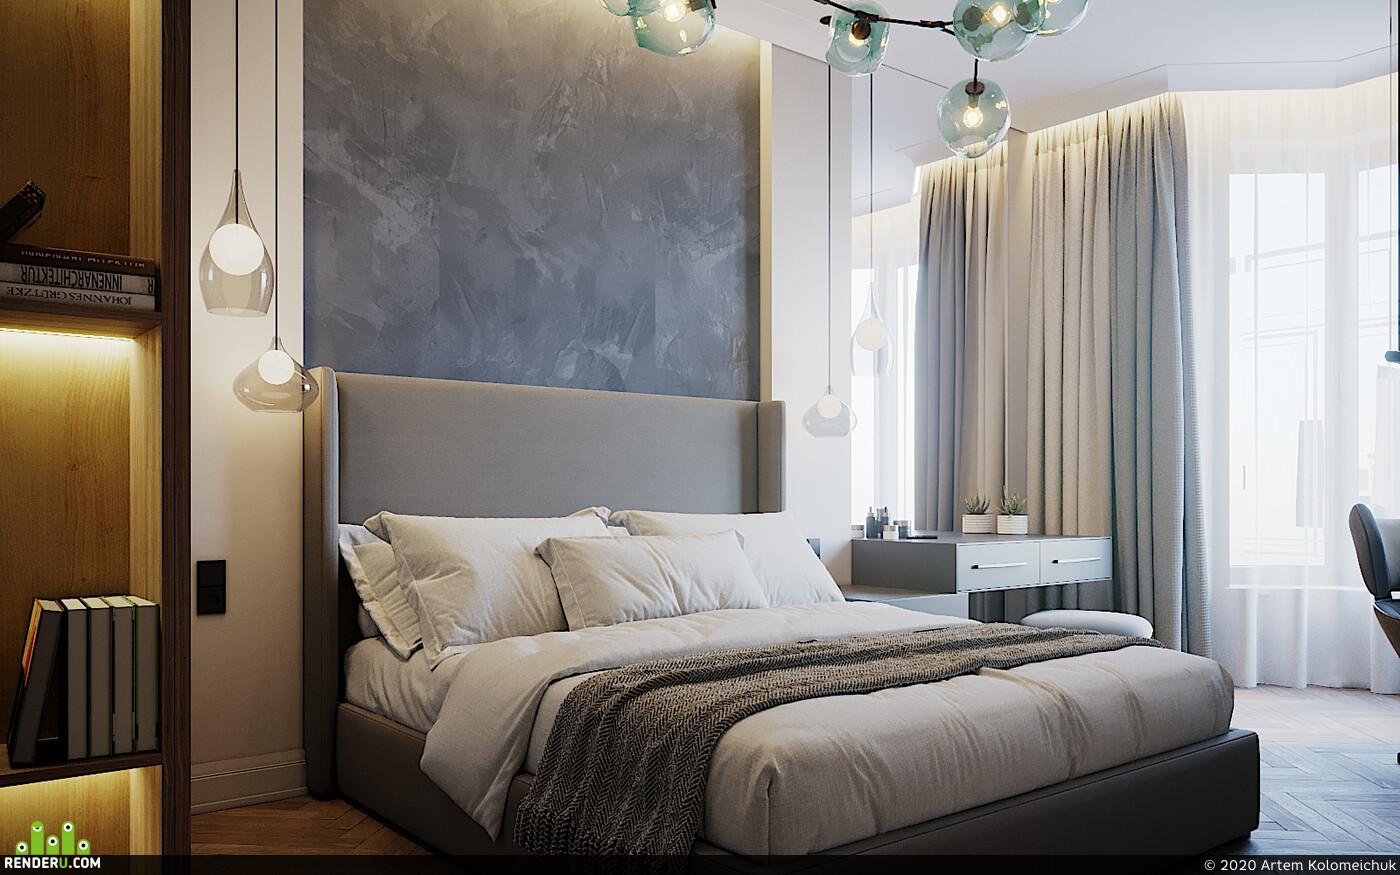 3d visualization, visualisation, architecture, interior, corona,, interior bedroom, interior vizualization